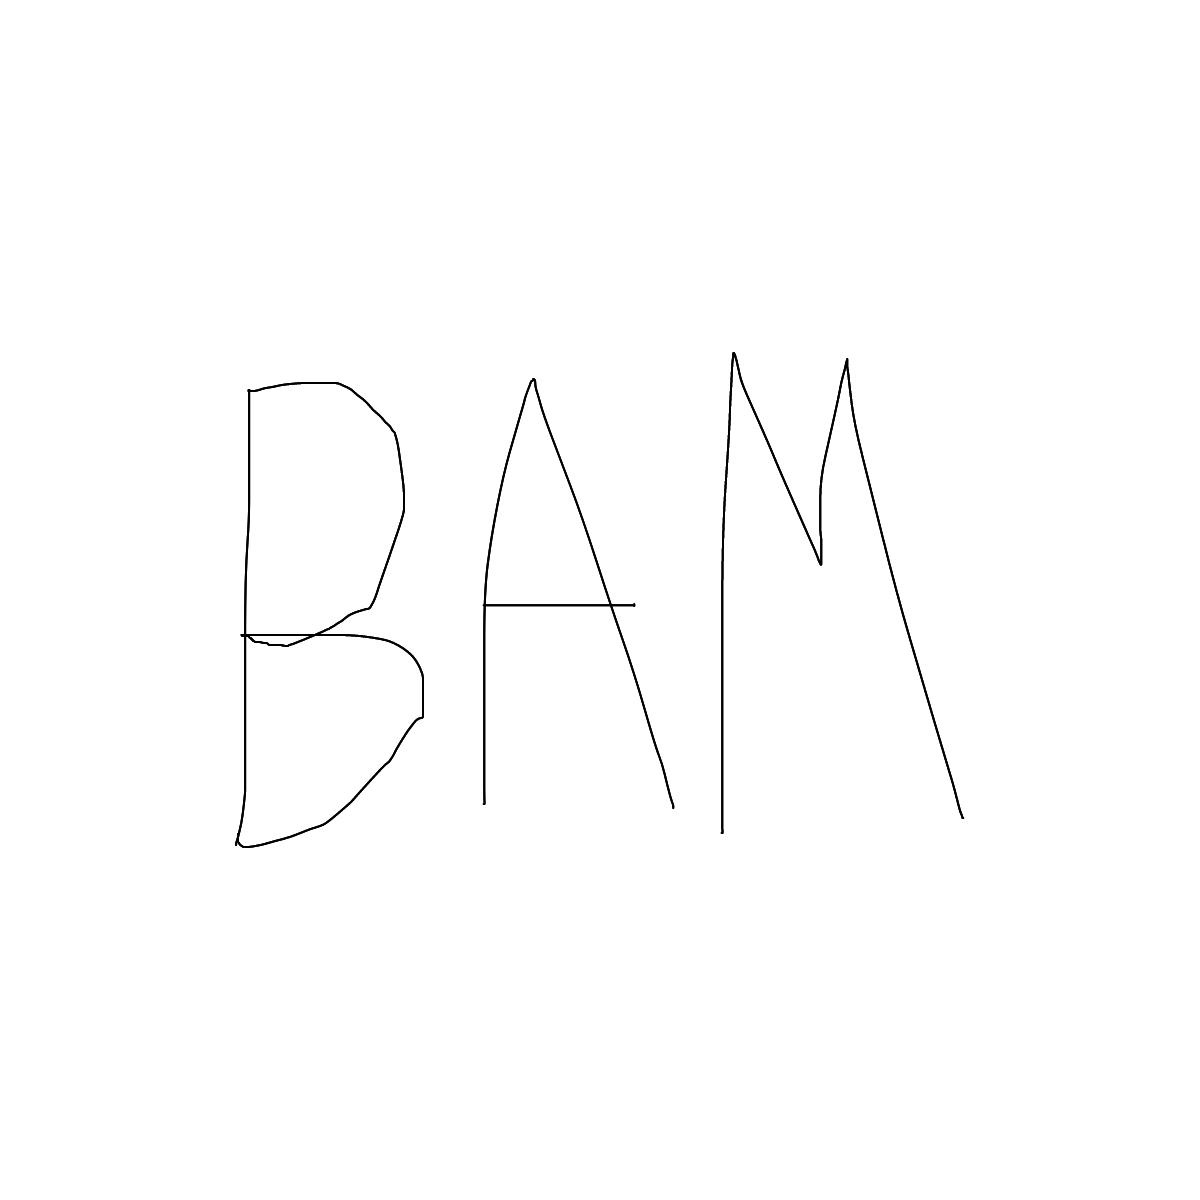 BAAAM drawing#23889 lat:37.0687561035156250lng: -94.5046920776367200